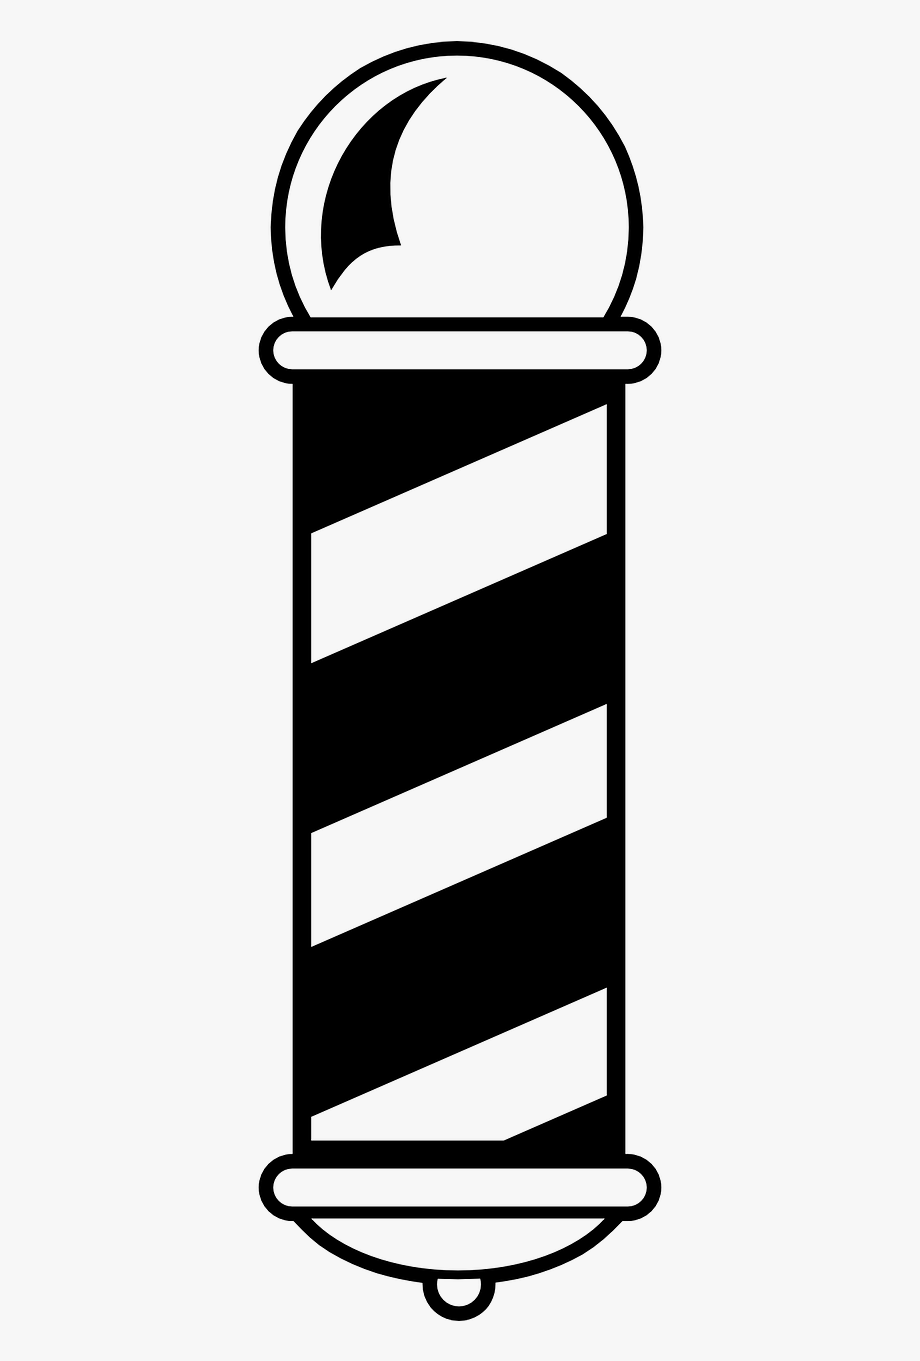 Barber Shop Pole Vector.